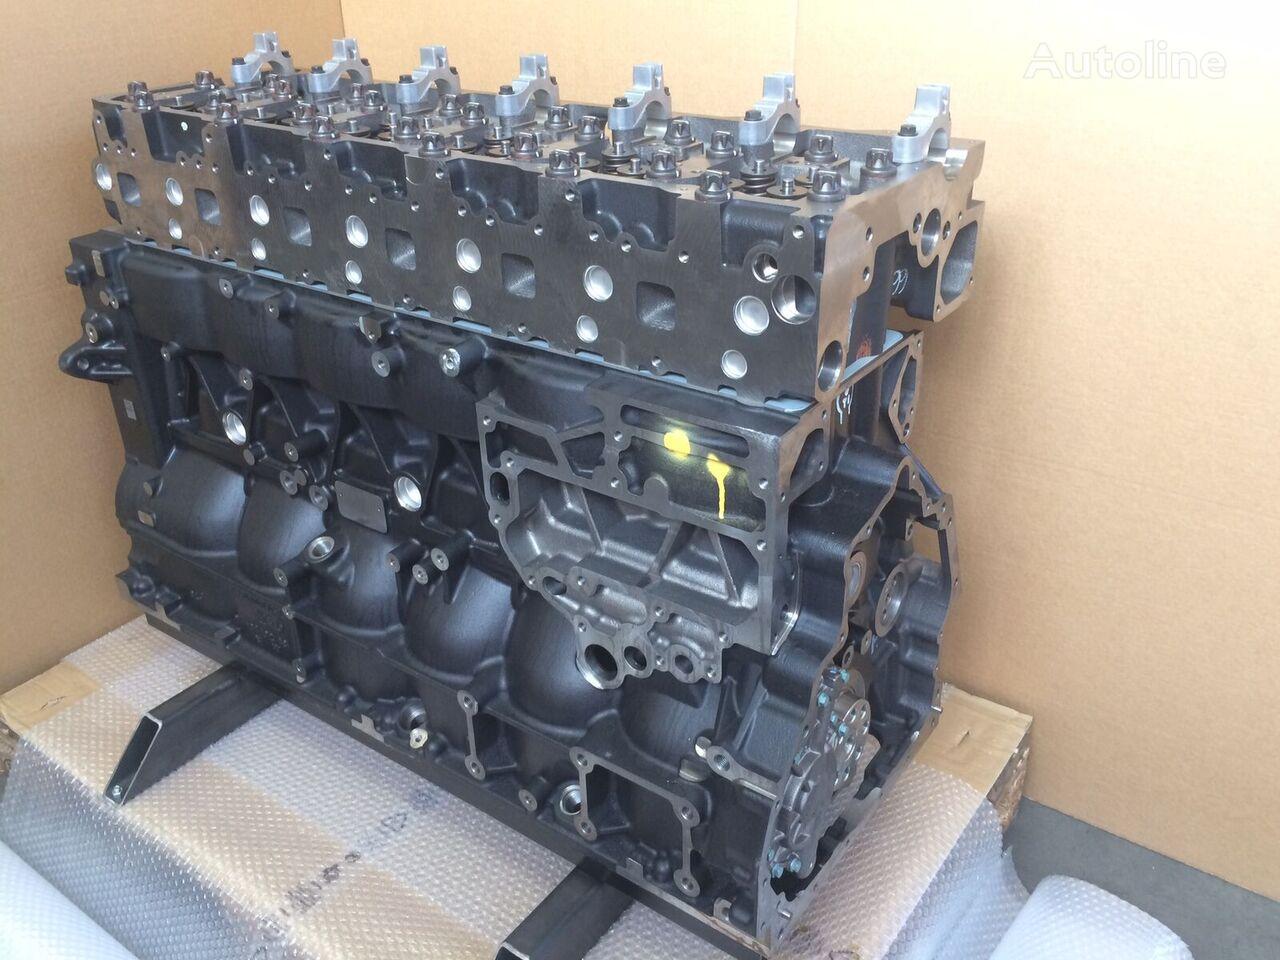 MAN D2676 LOH32 - AUTOBUS VERTICA engine for bus